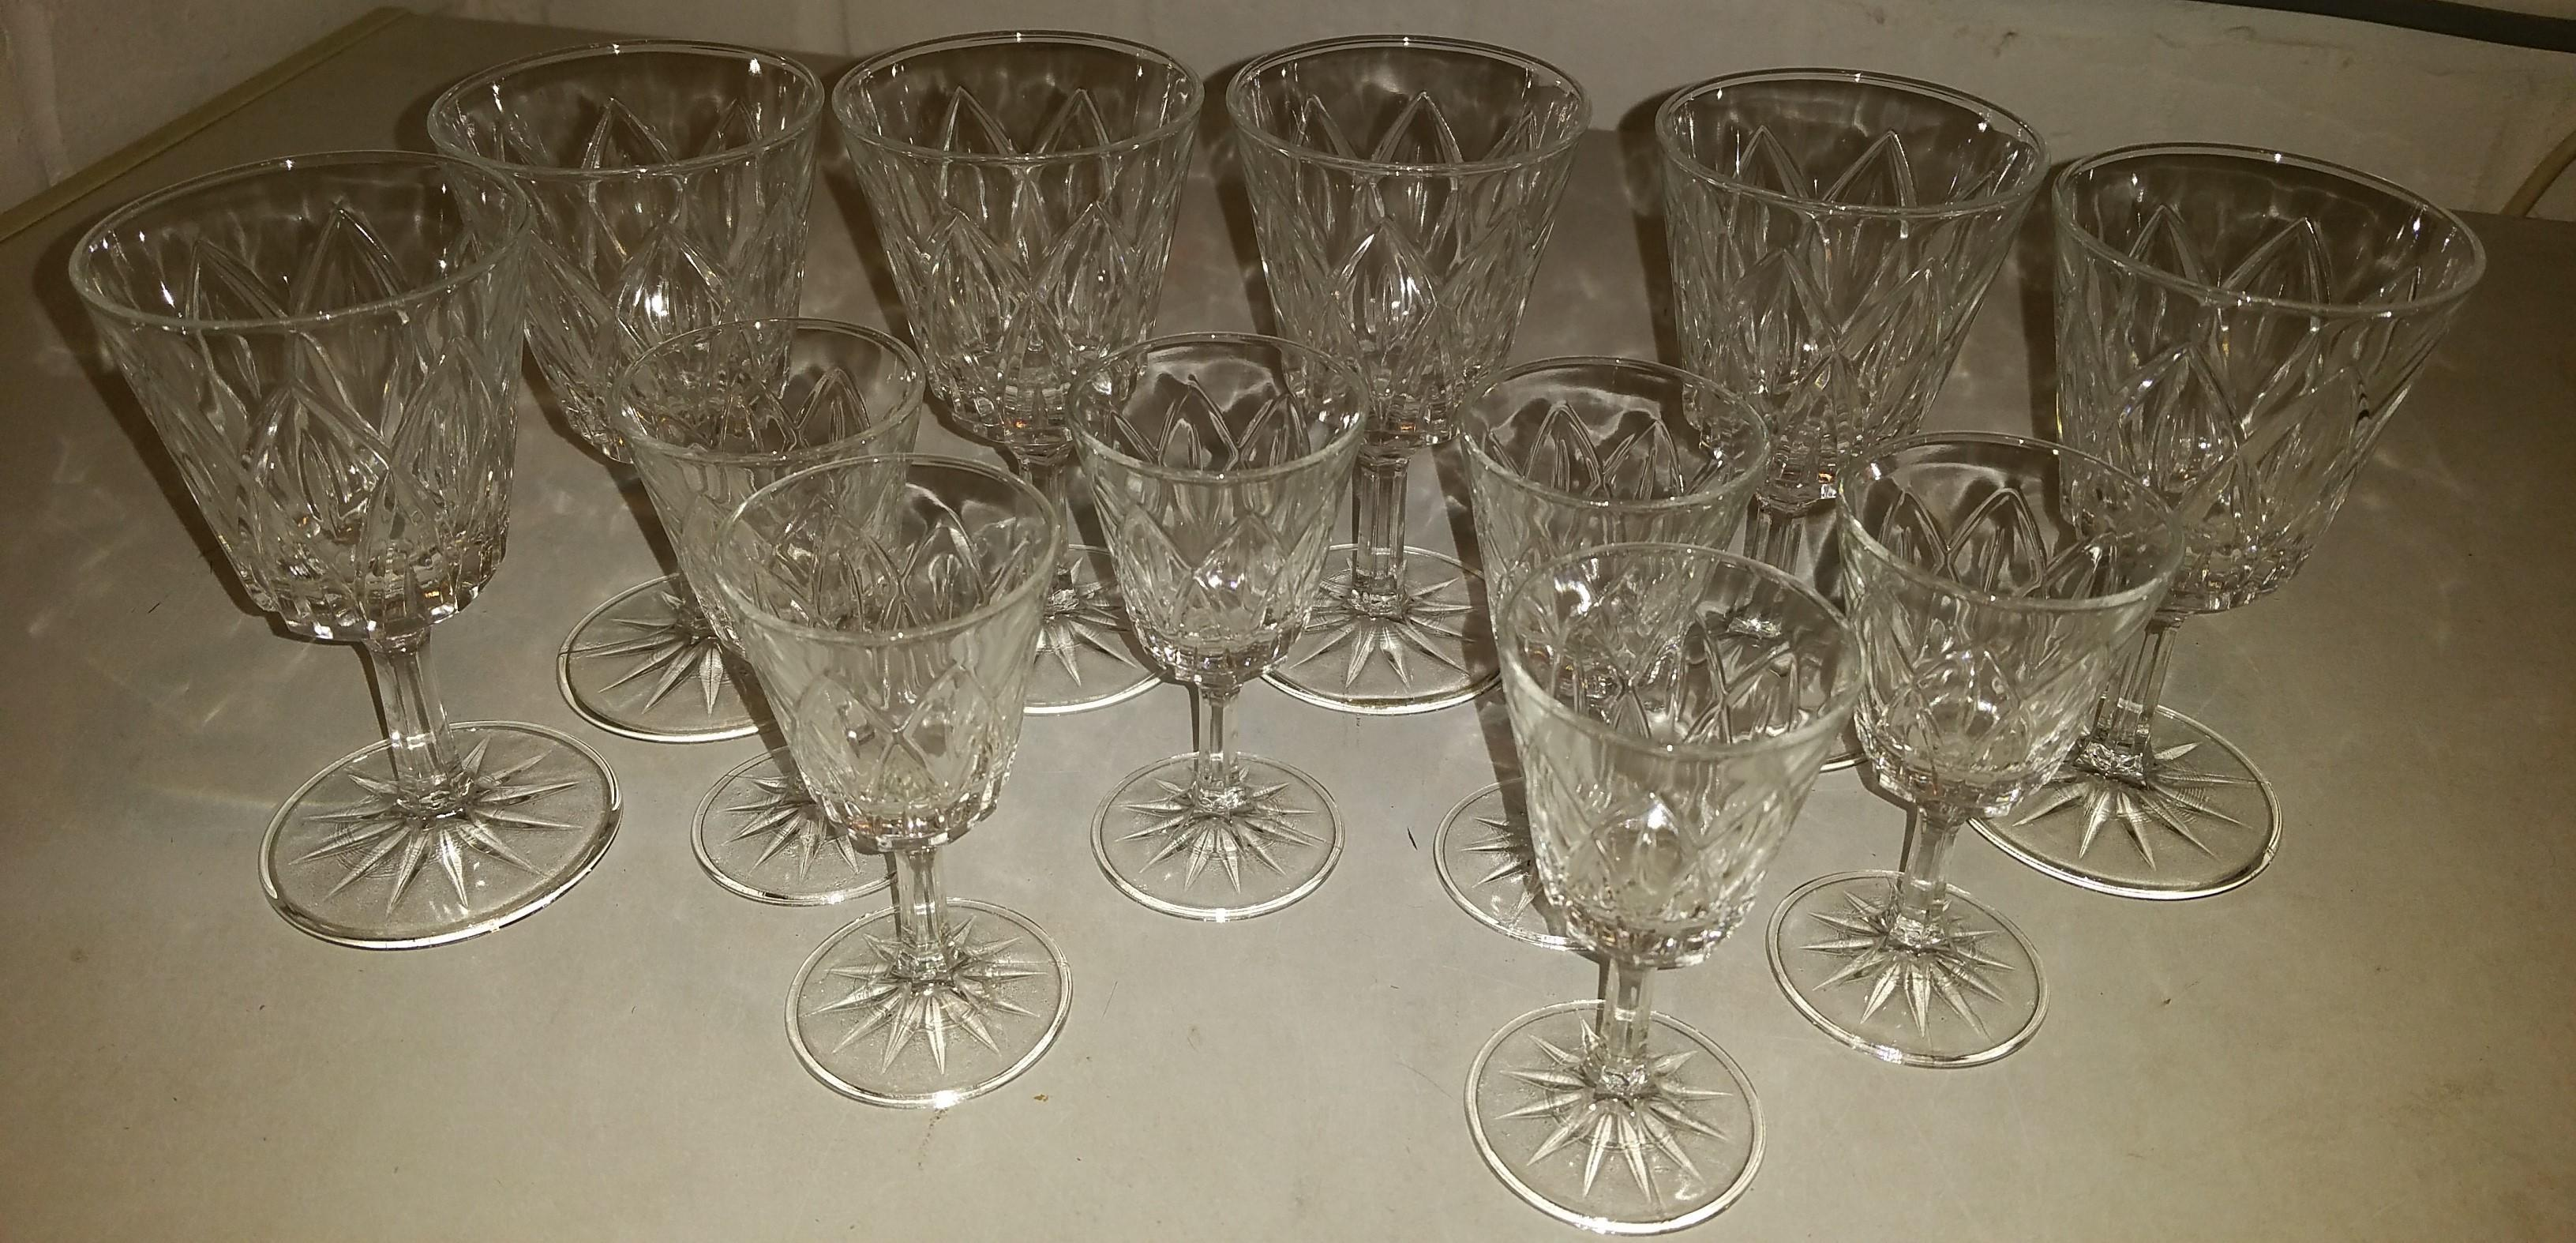 Diamond shaped vintage cut glass 2 sets of port/sherry